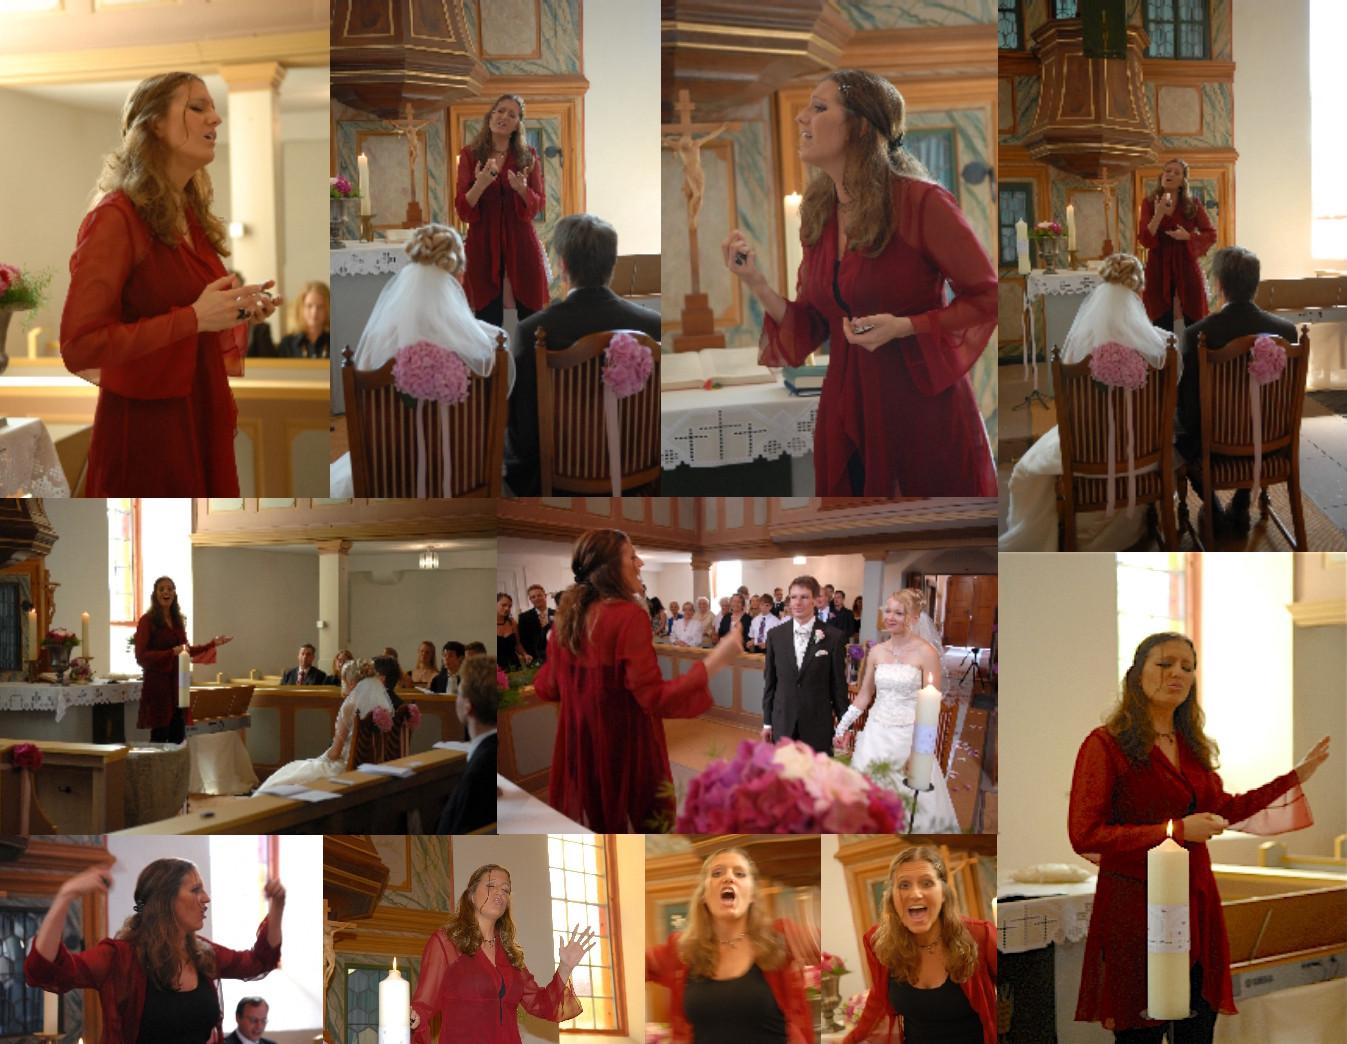 Neckermann Weddingstyle Fotocollage Gospel Sologesang pur